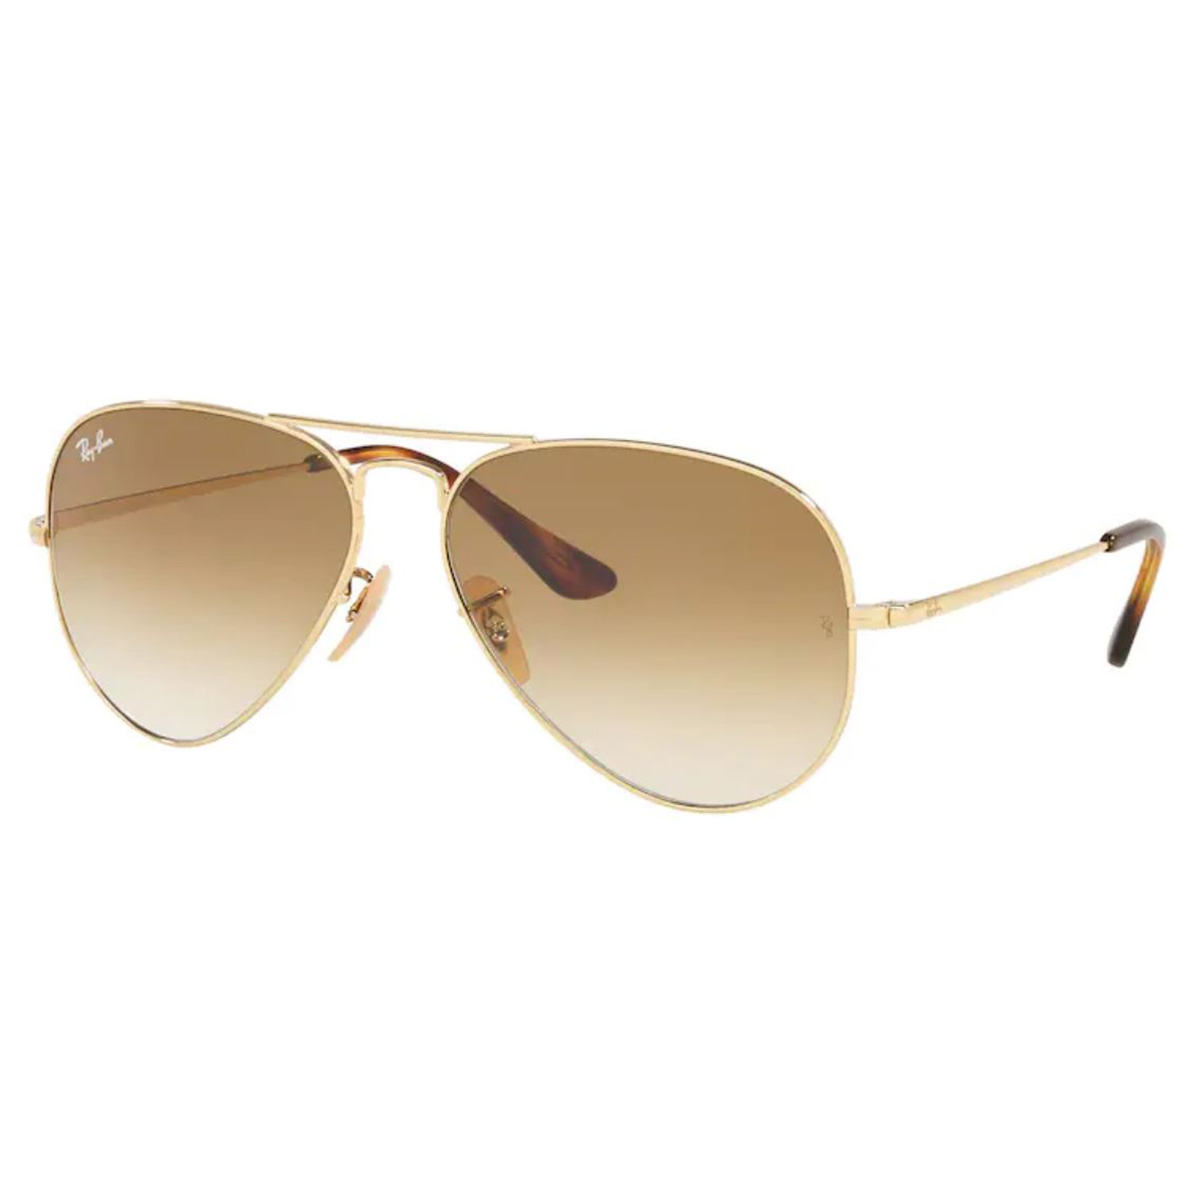 Óculos de Sol RayBan RB3689L Aviator Metal II Dourado Tamanho 58